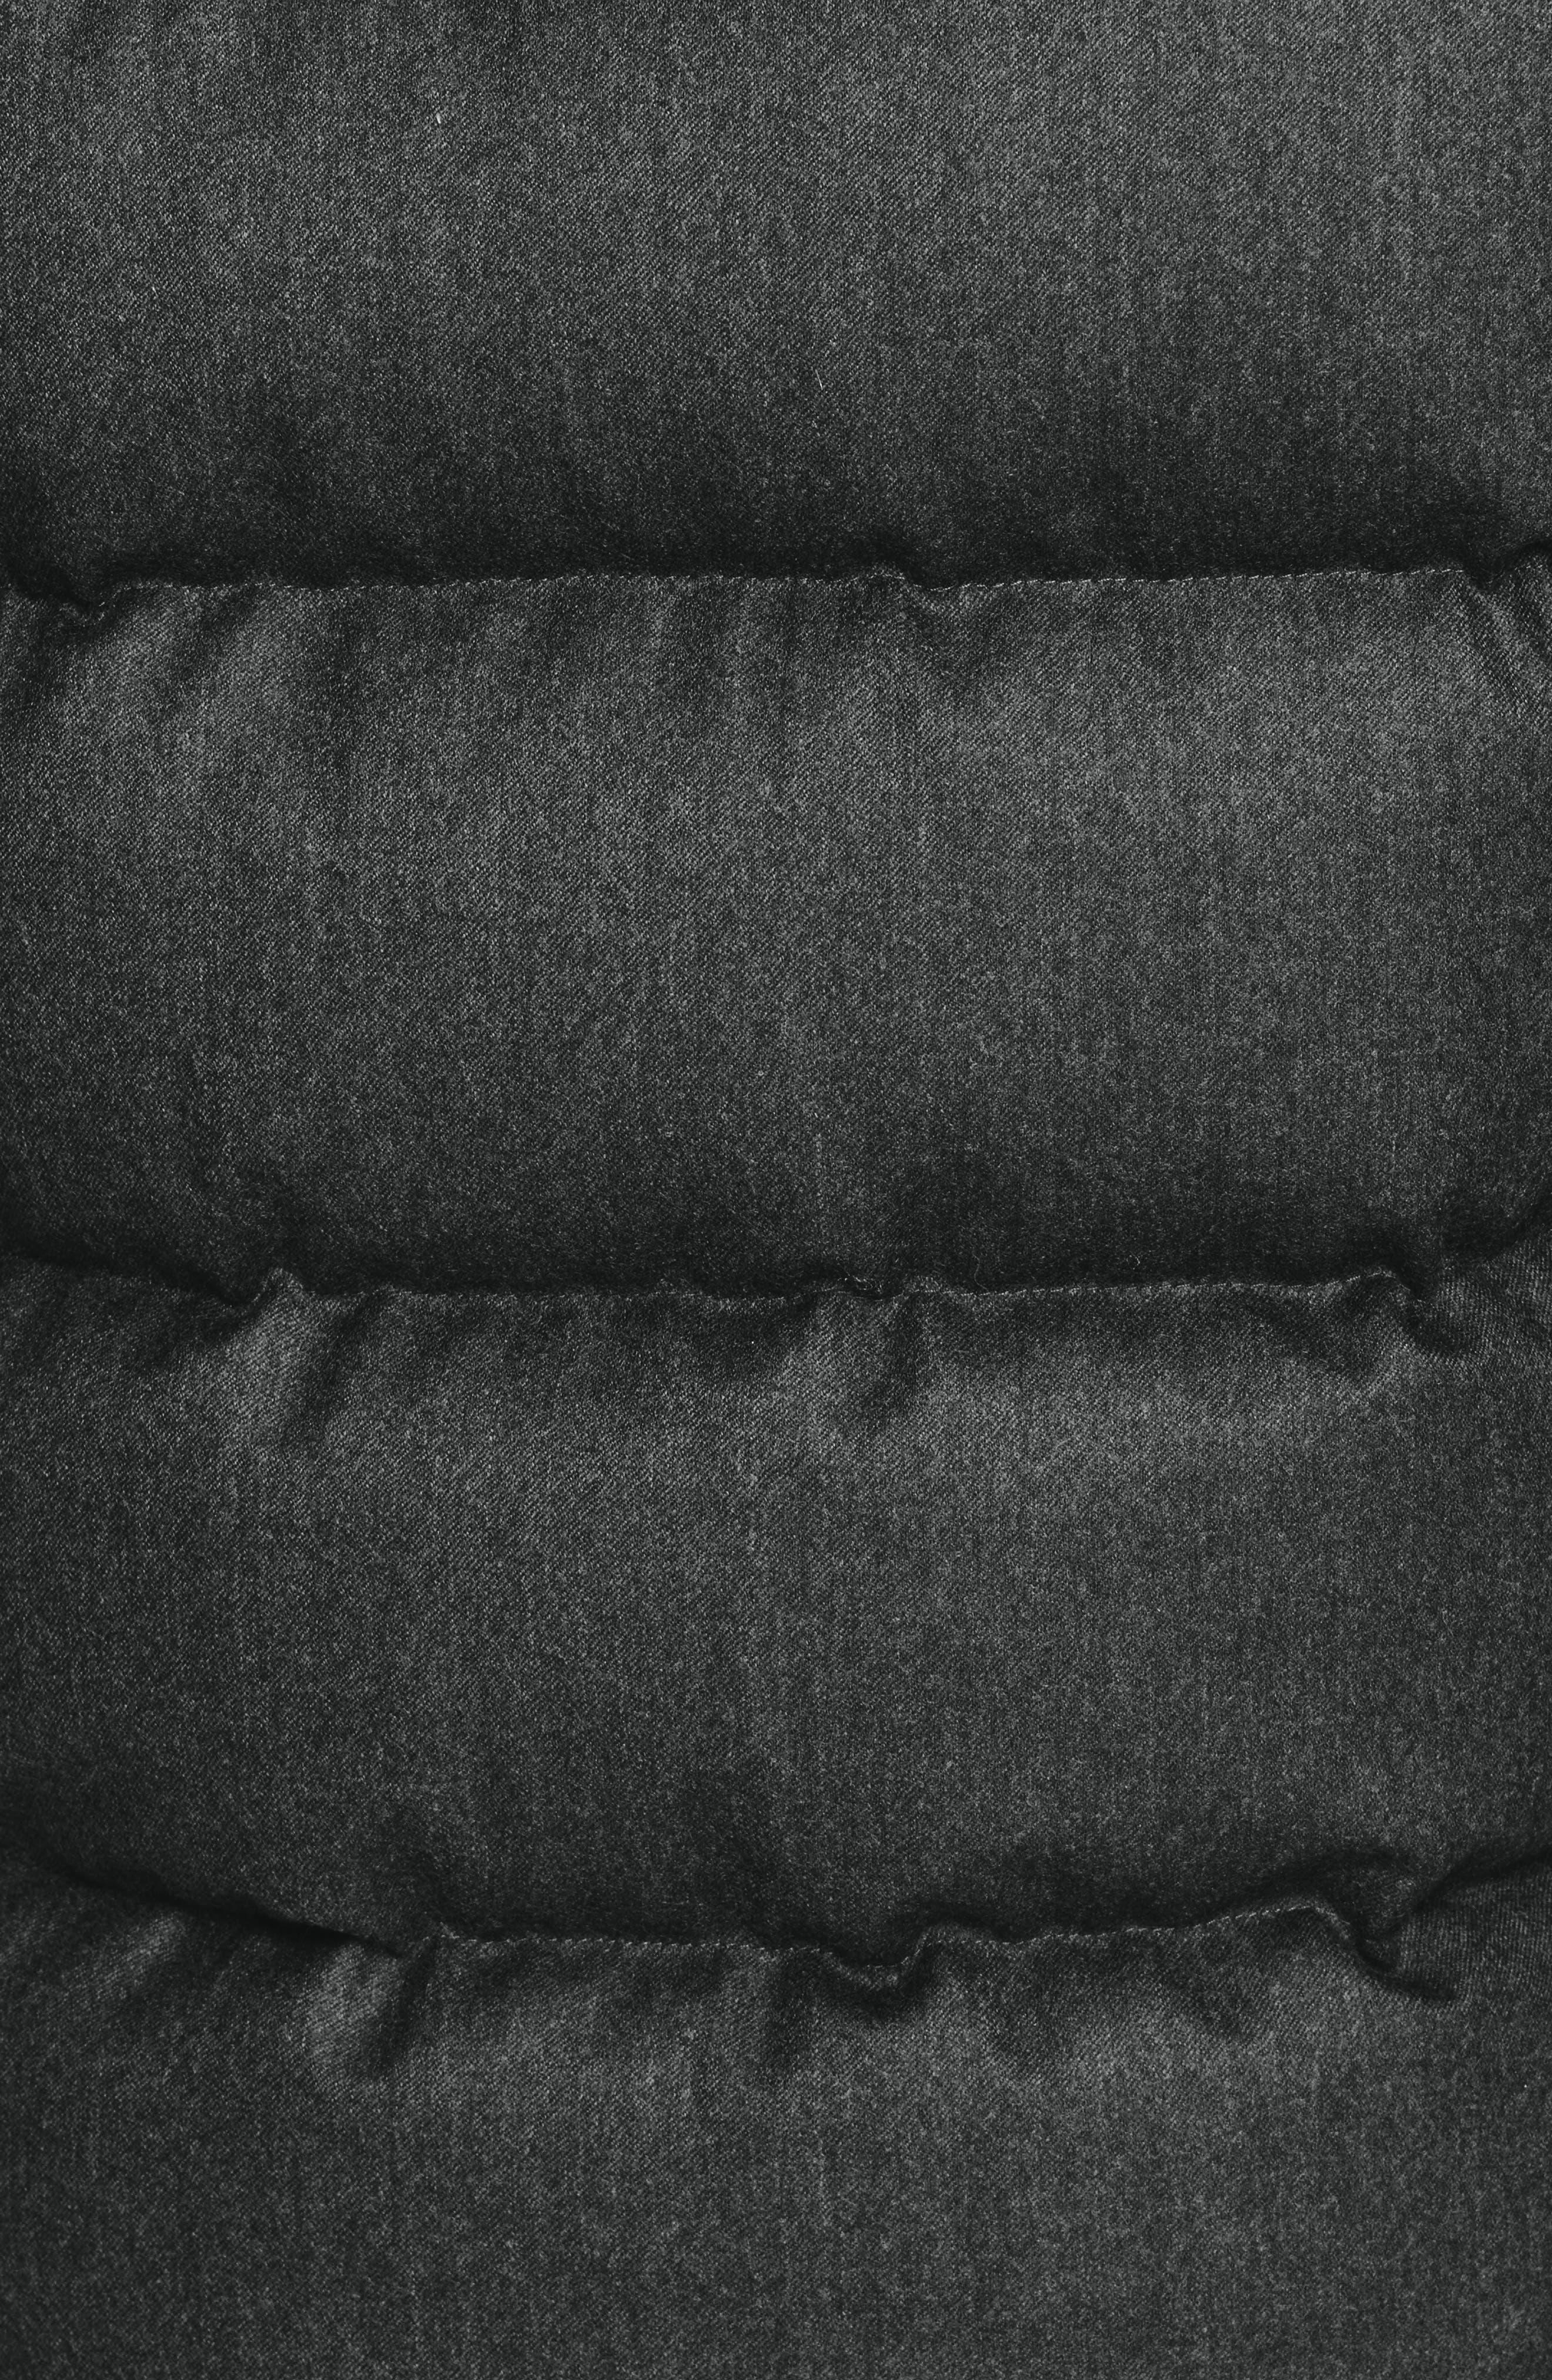 'Montgenevre' Quilted Down Jacket,                             Alternate thumbnail 5, color,                             301